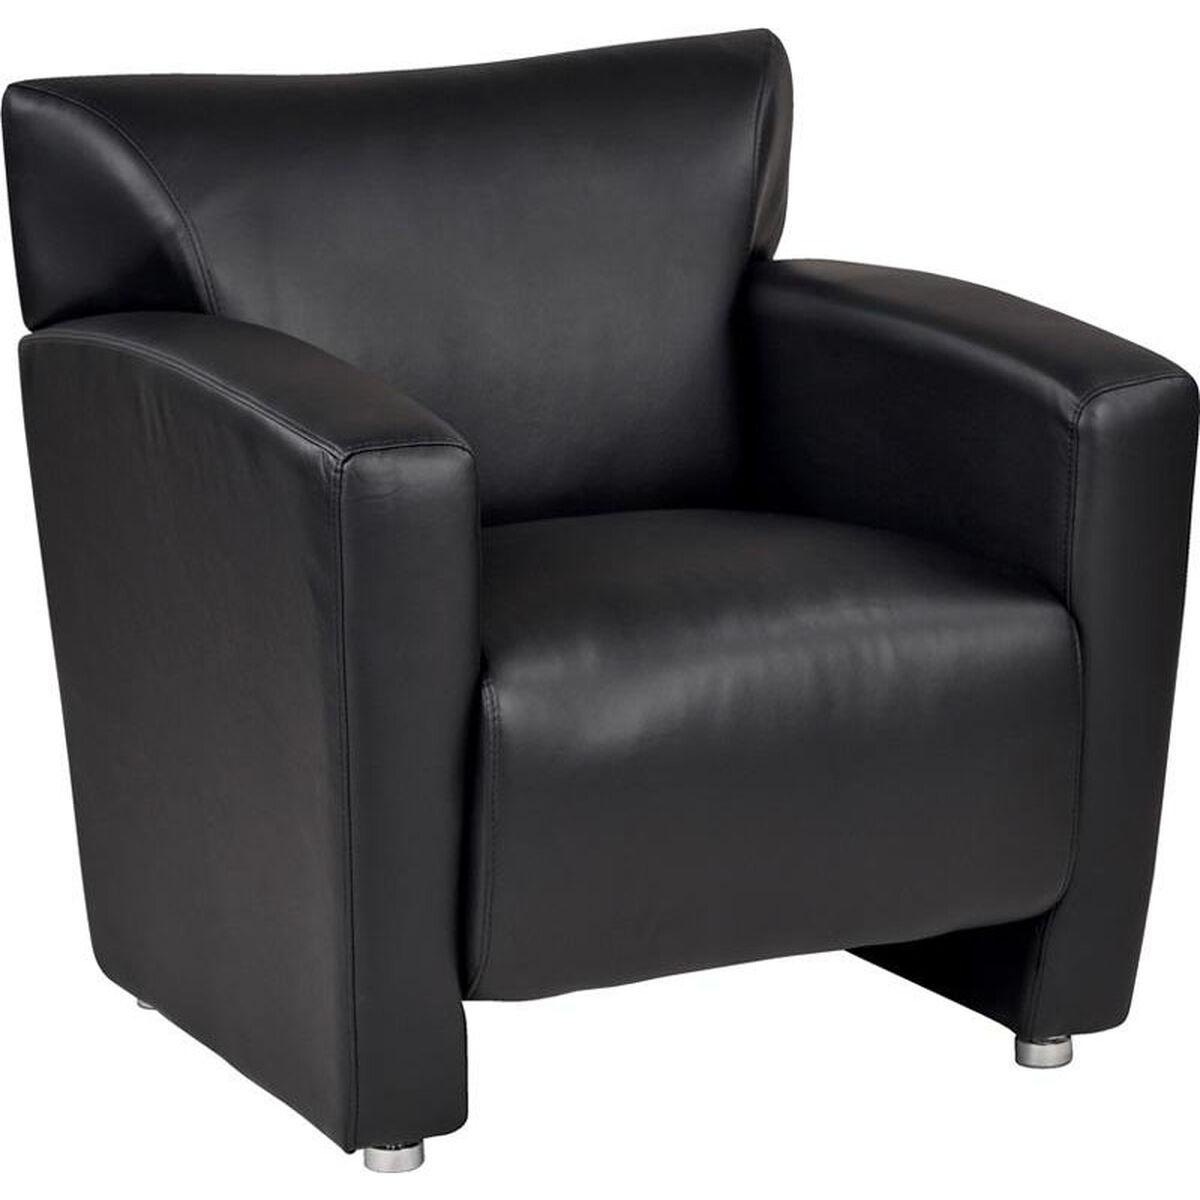 black faux leather club chair sl2911s u6 restaurantfurniture4less com